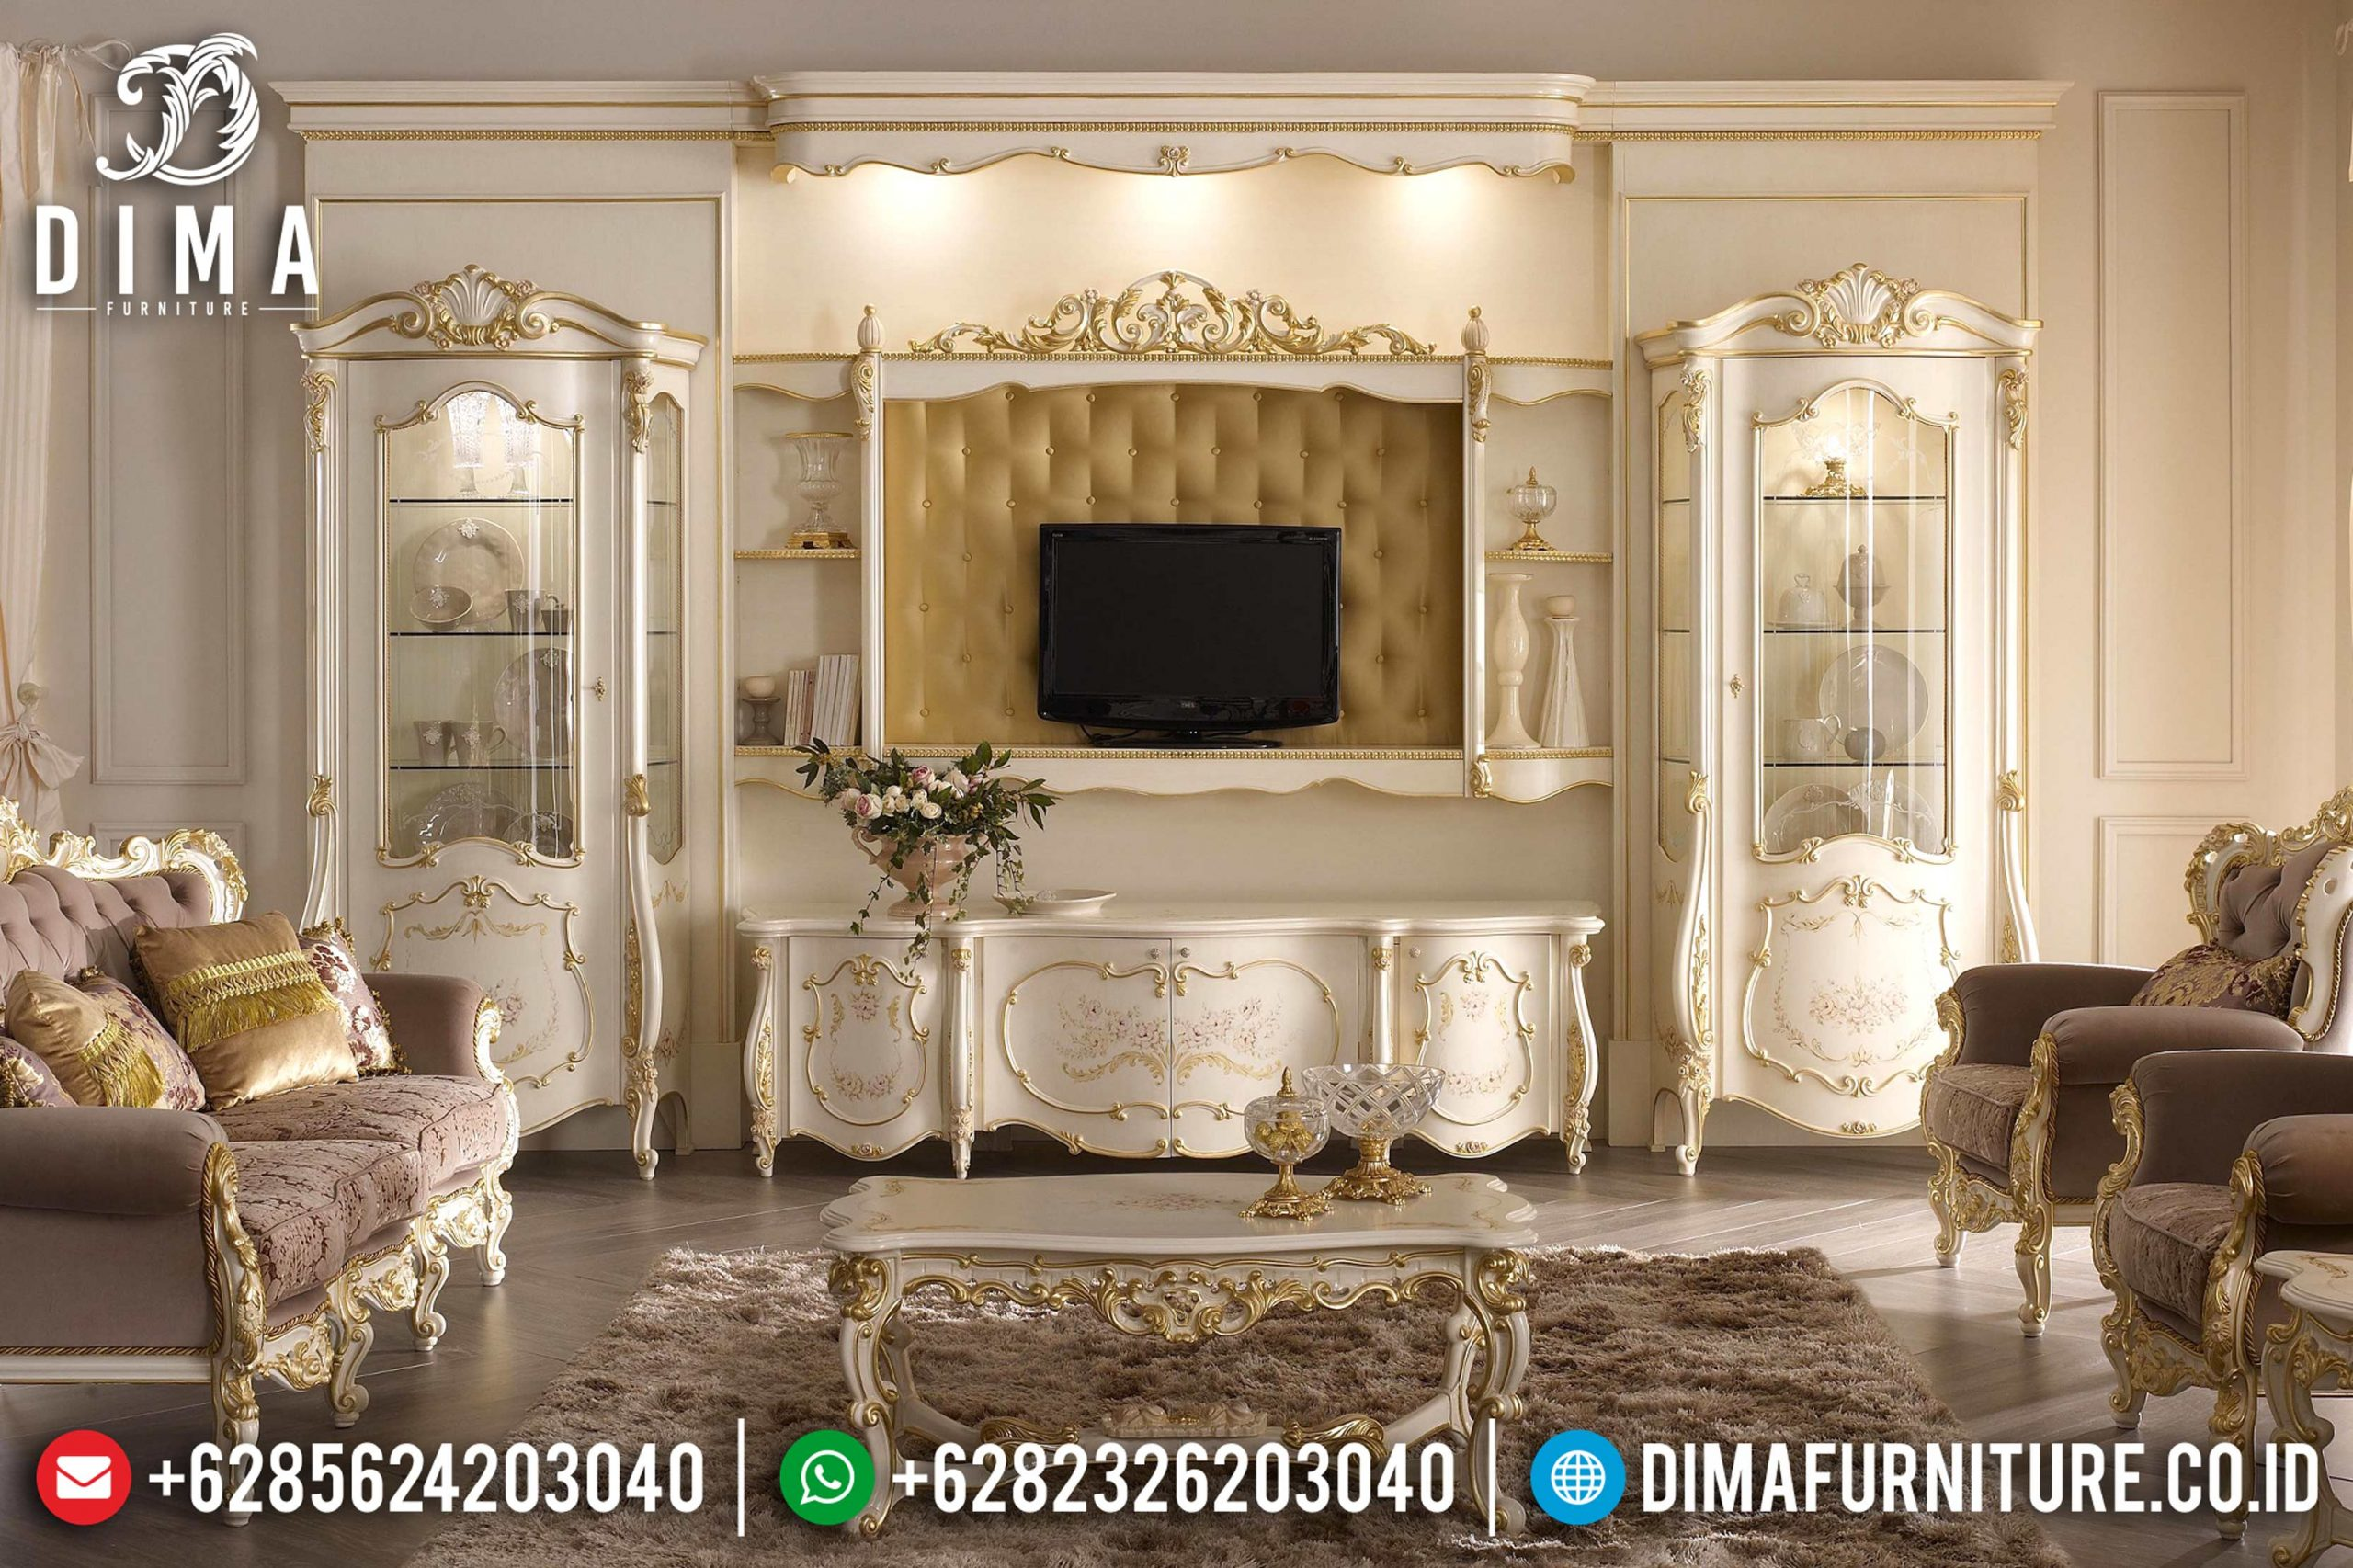 Set Bufet Tv Mewah Elegan Klasik Mebel Jepara MM-0429